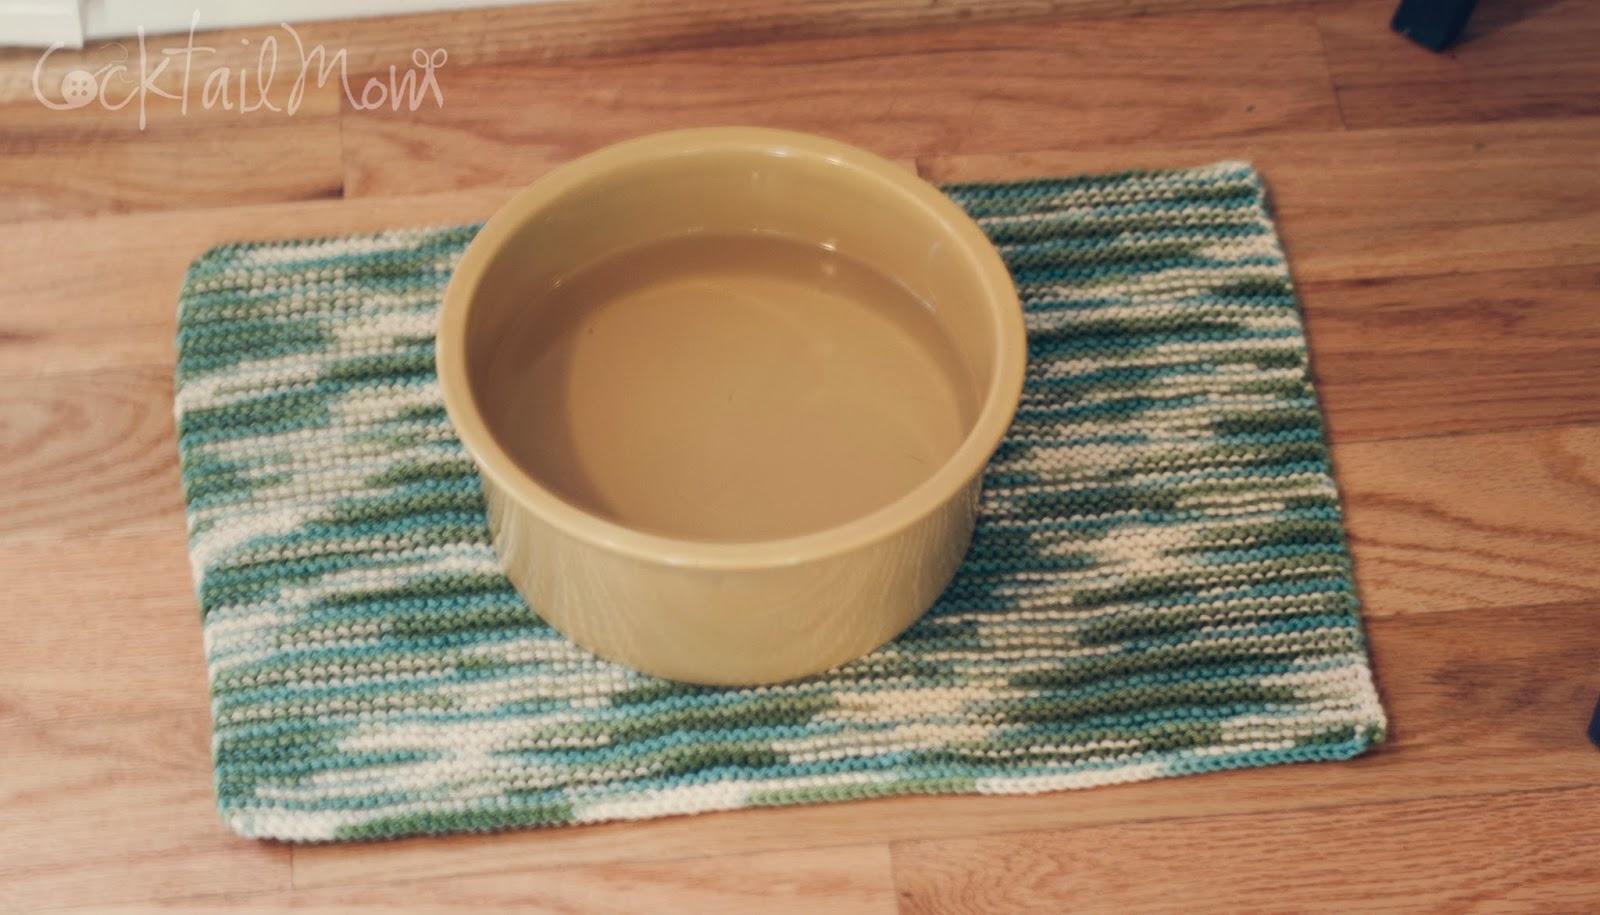 CocktailMom: Crochet Dog Bowl Mat